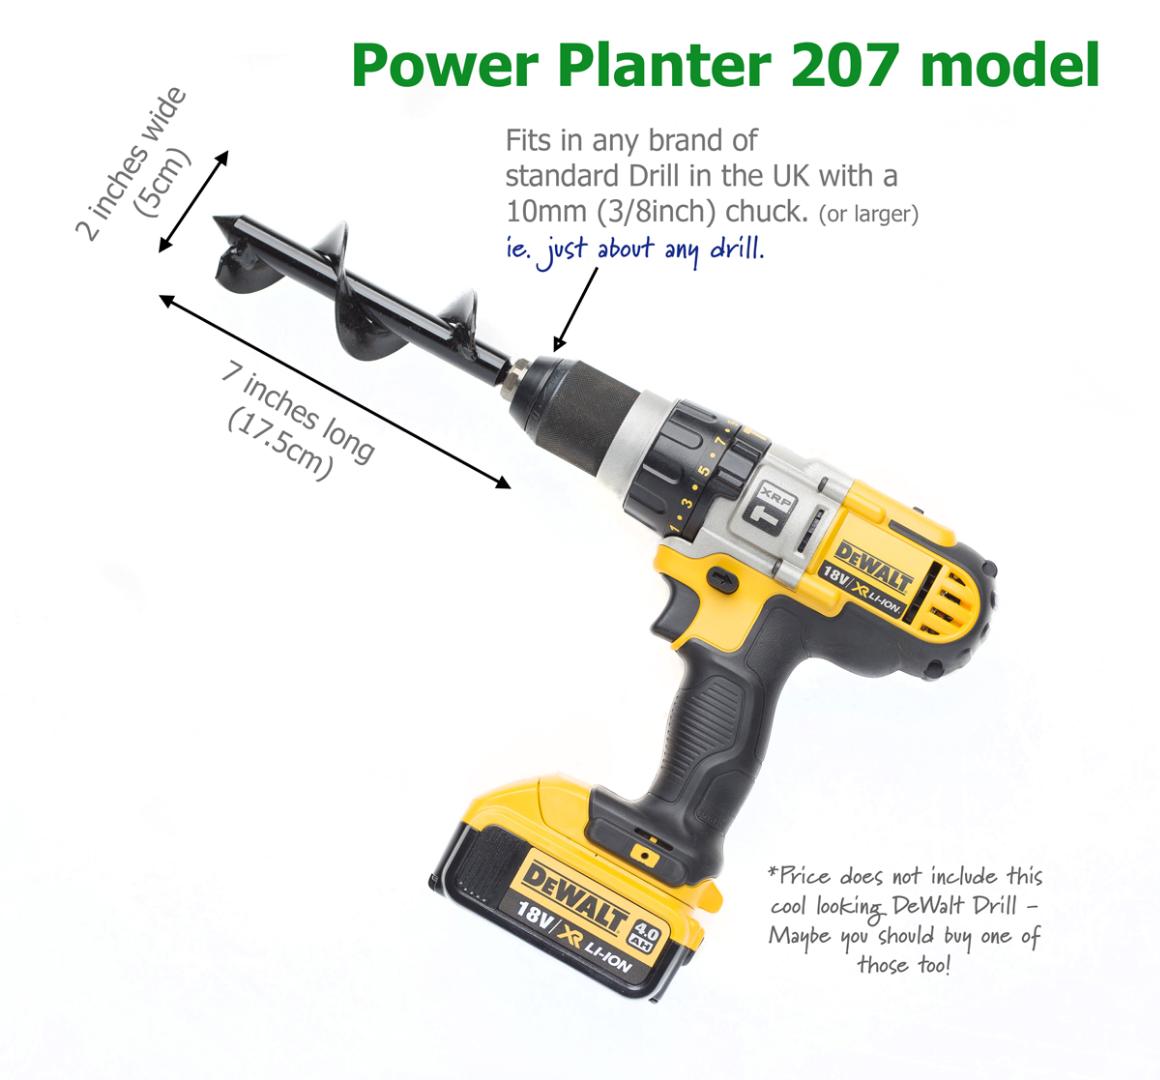 207 Power Planter